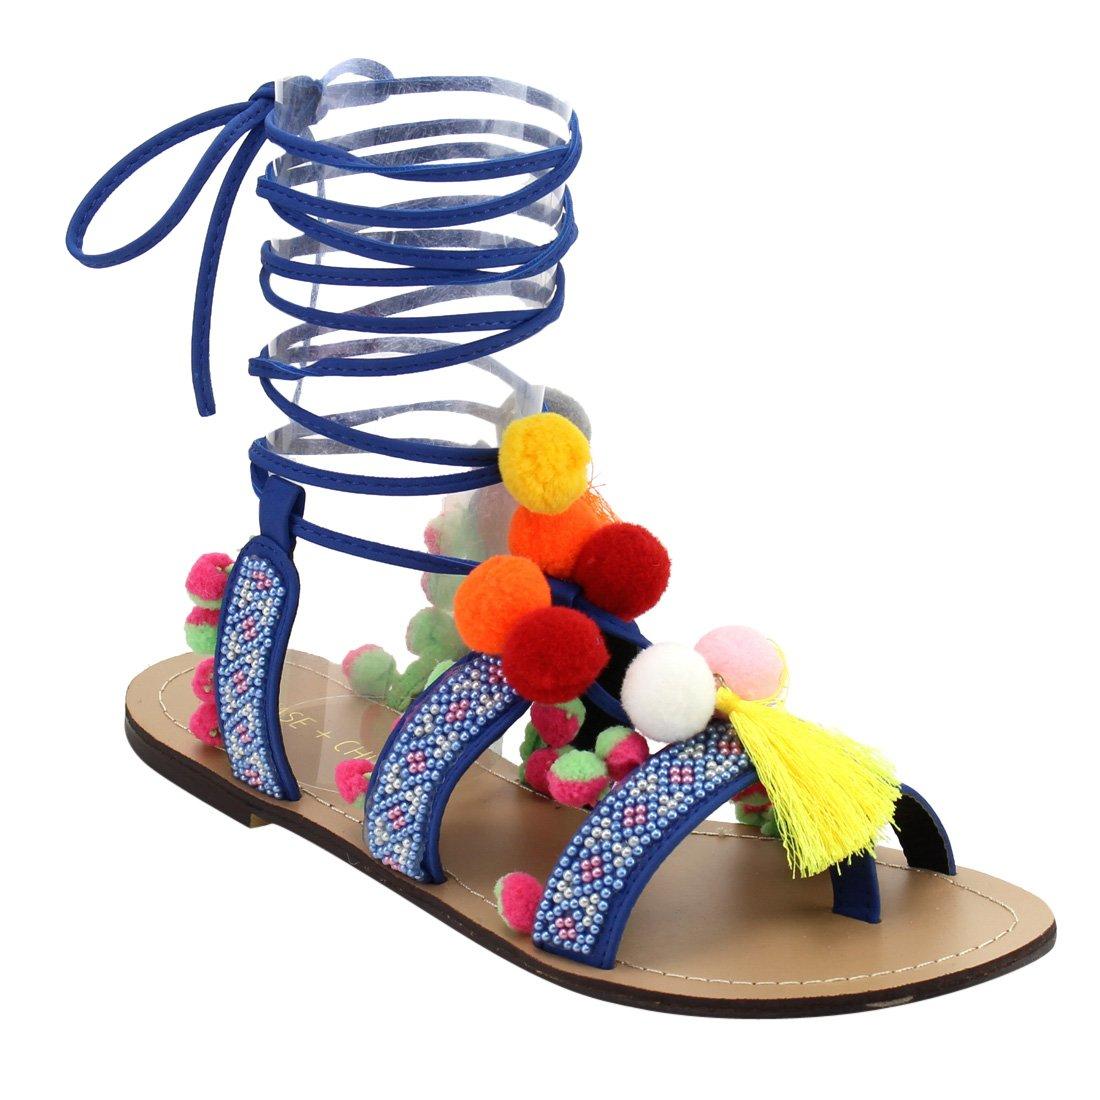 Chase & Chloe EF71 Women's Leg Wrap Tassel Pom-Pom Beads Flat Sandals, Color:BLUE, Size:6